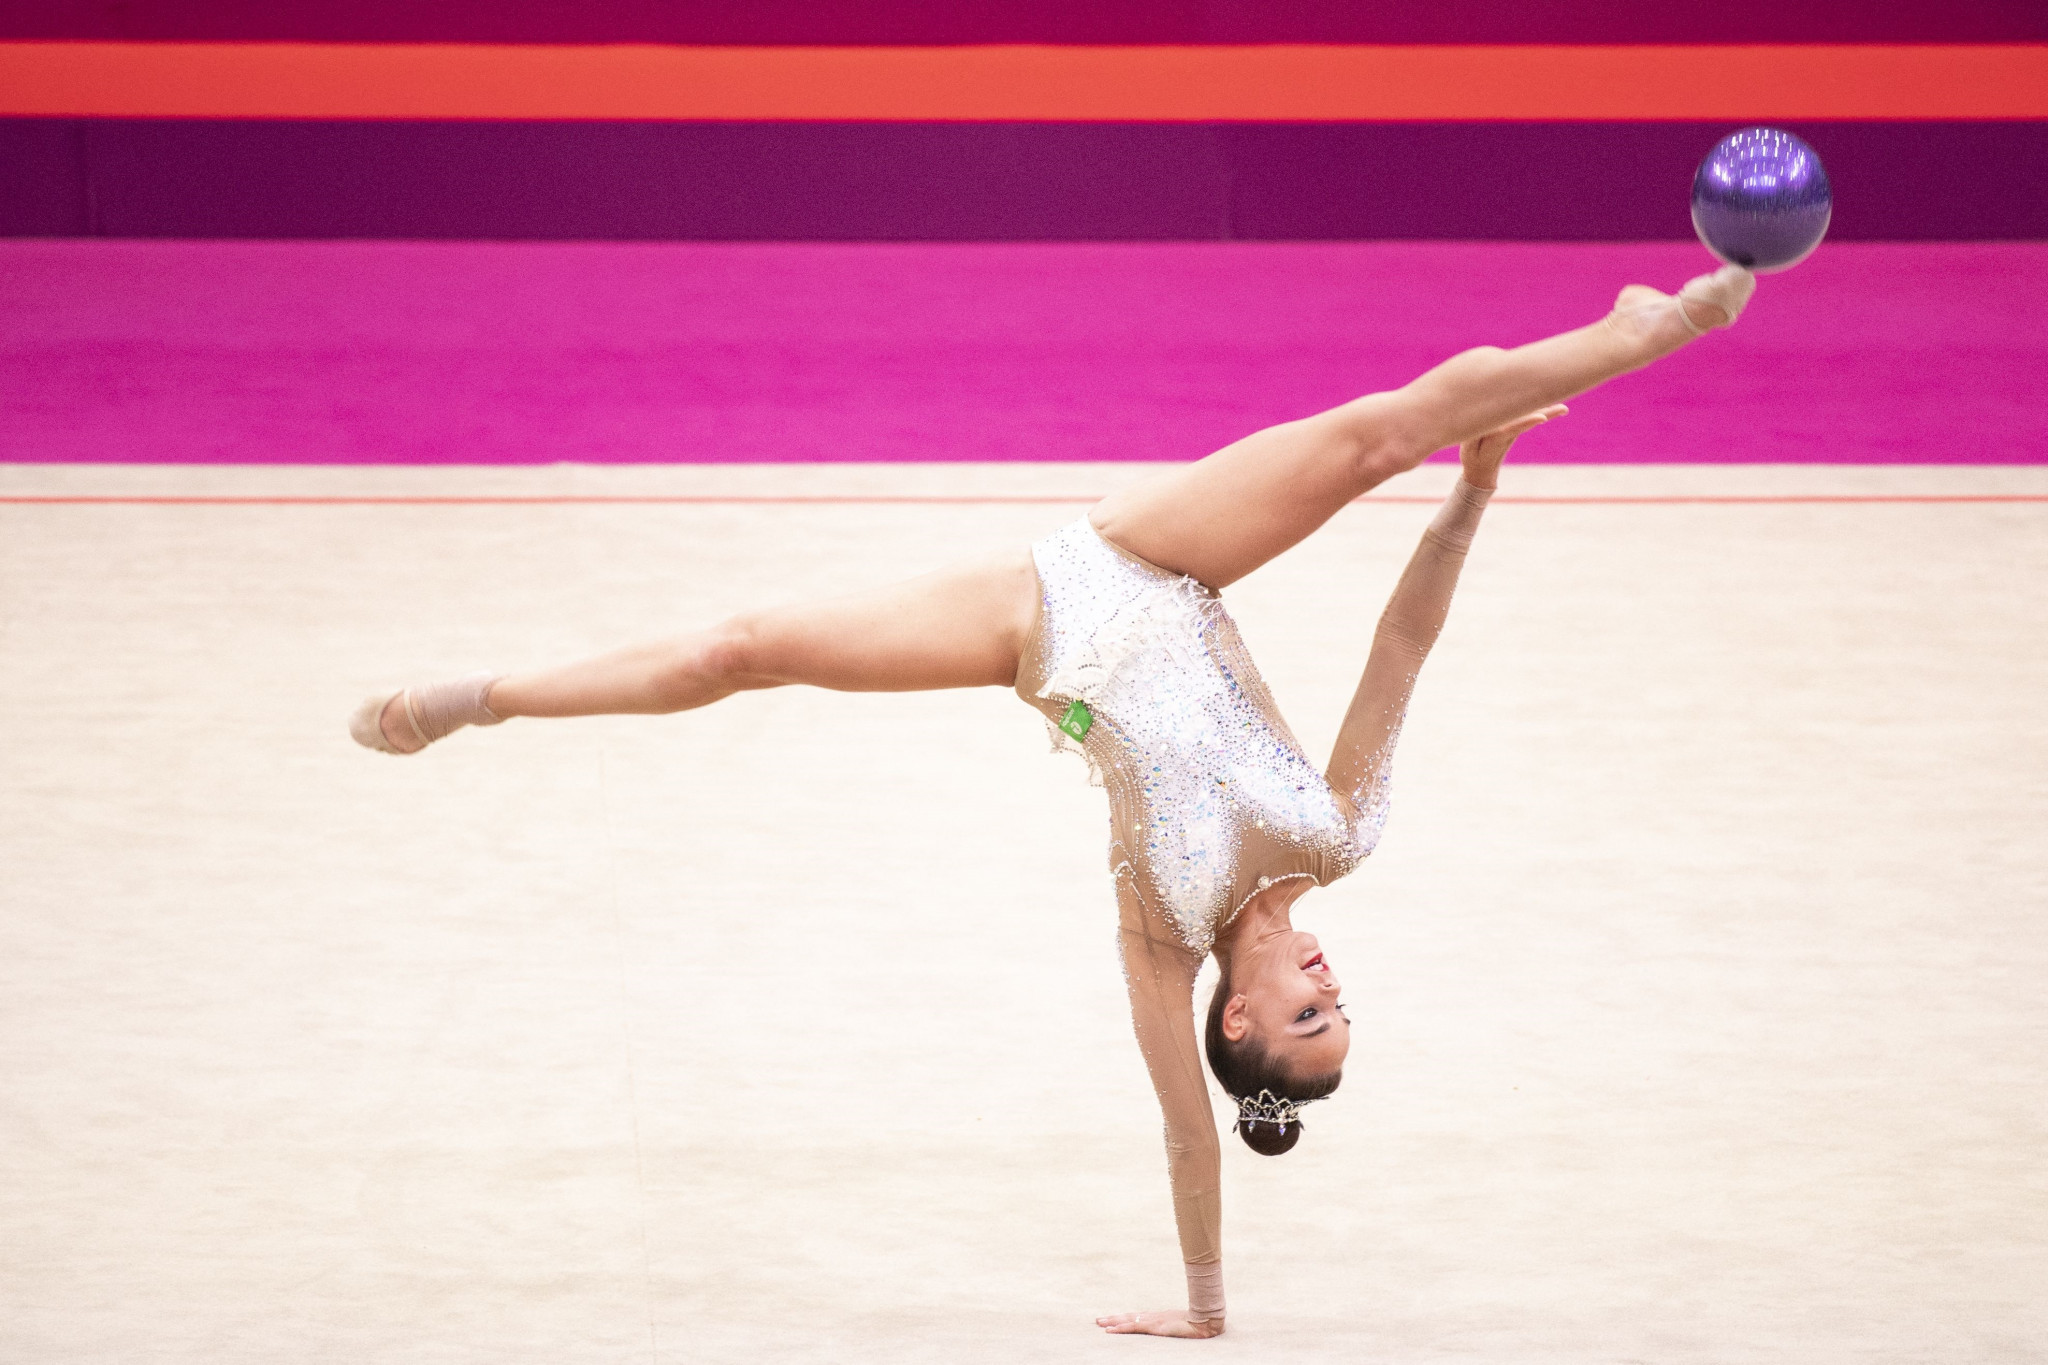 Averina scores golden double at Rhythmic Gymnastics World Championships